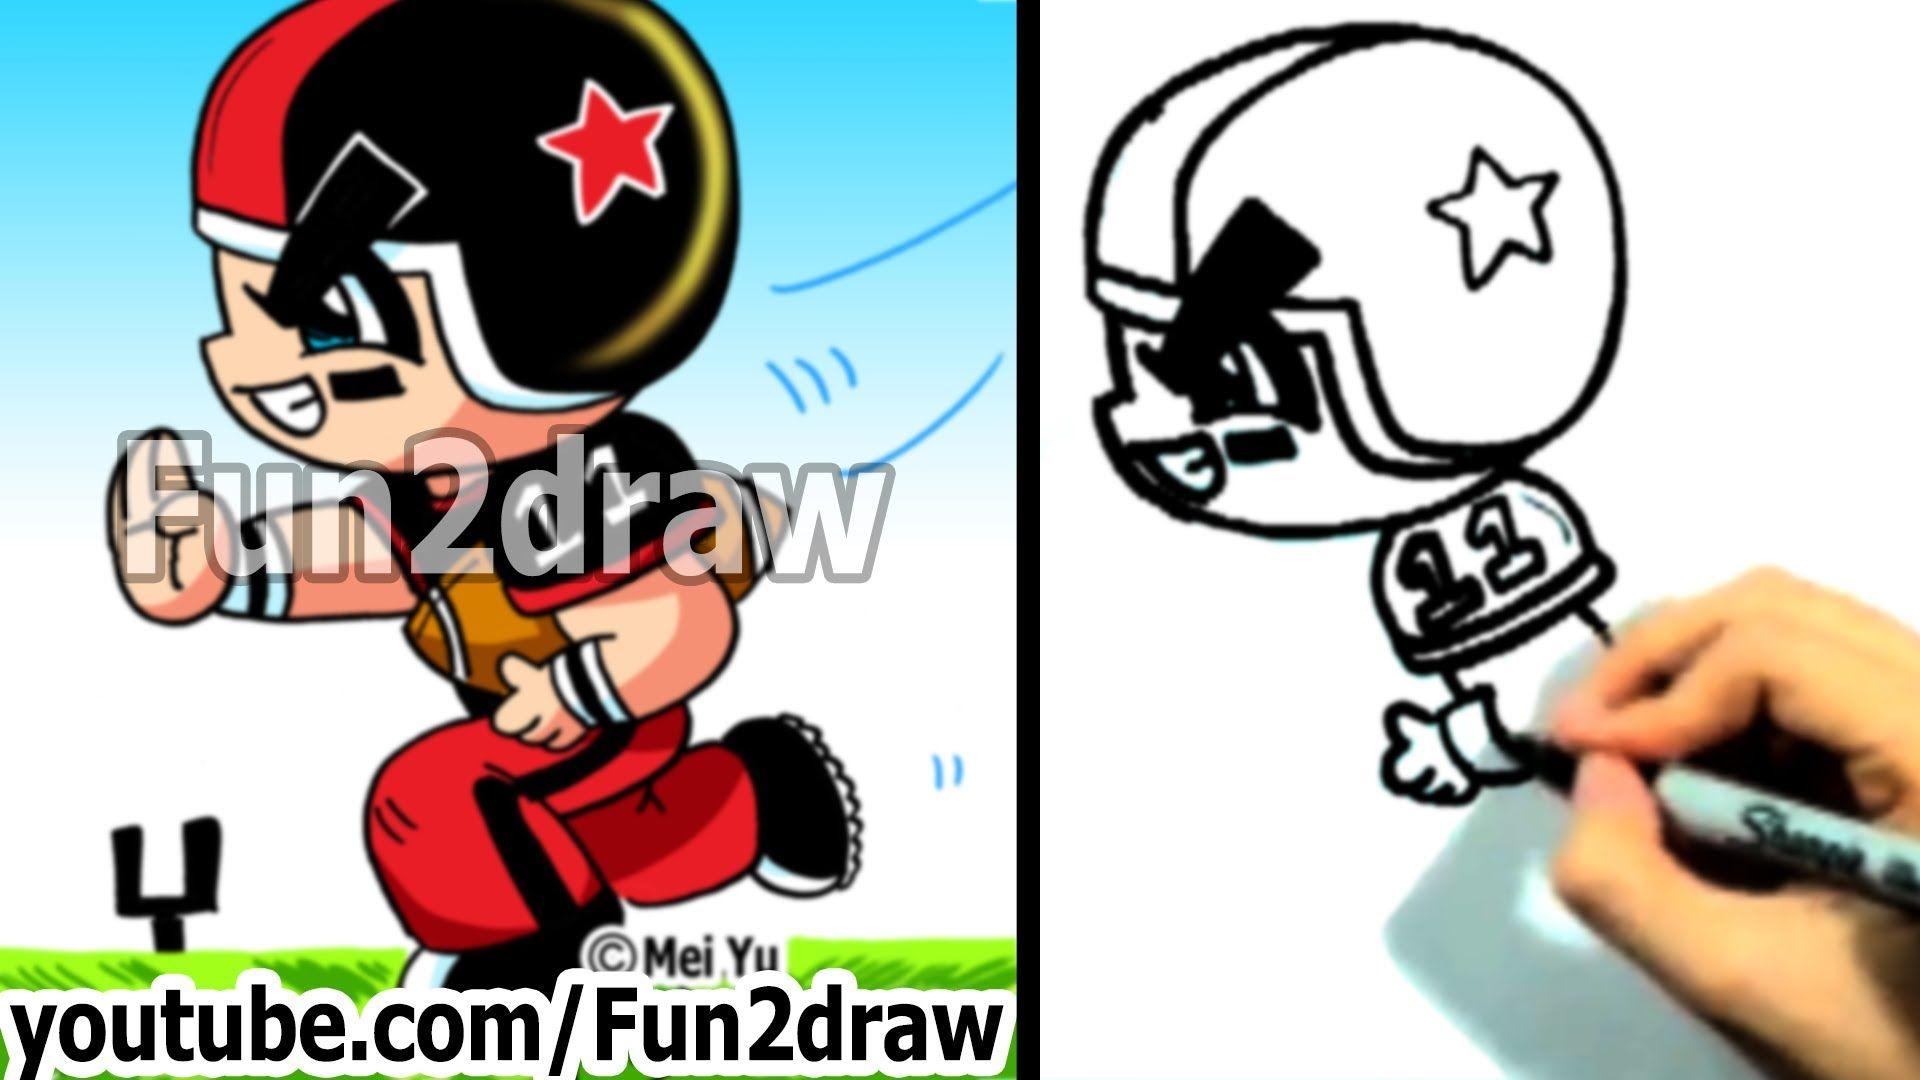 How to draw cartoon people football player cartoon